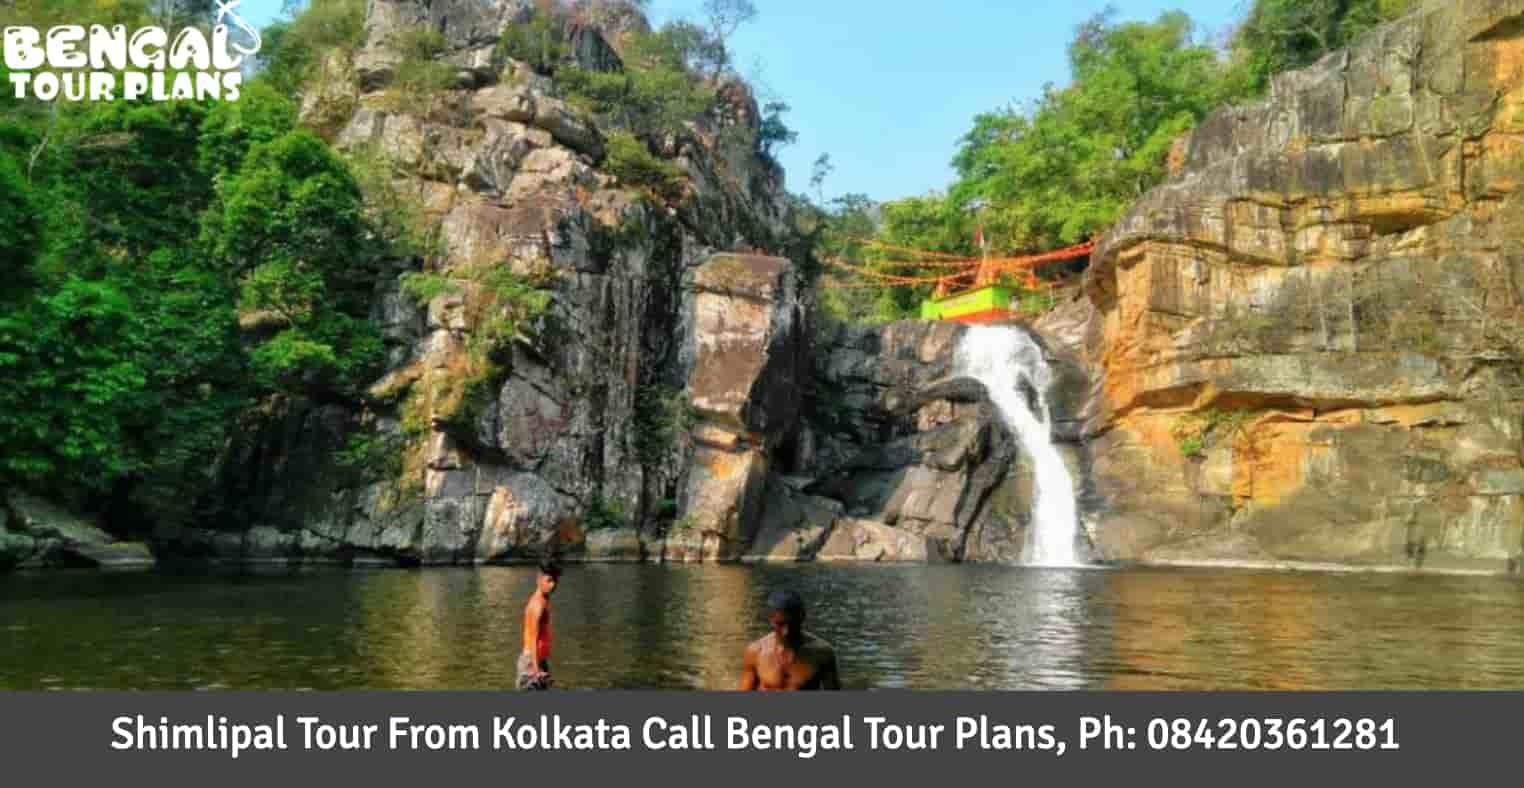 Shimlipal Tour Package From Kolkata